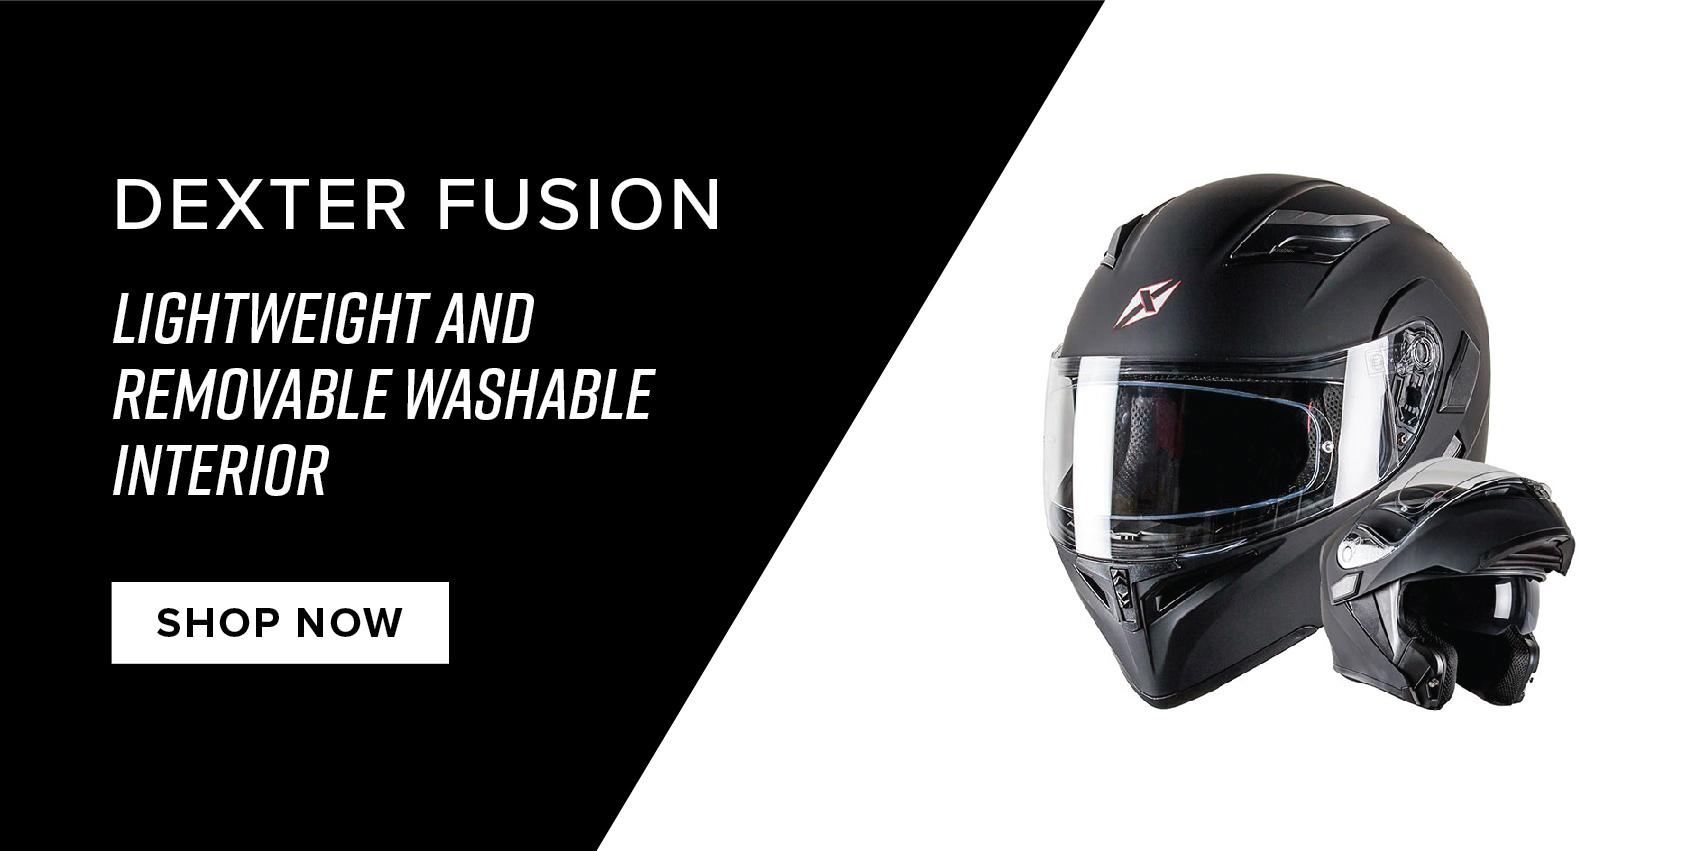 Dexter Fusion Helmet